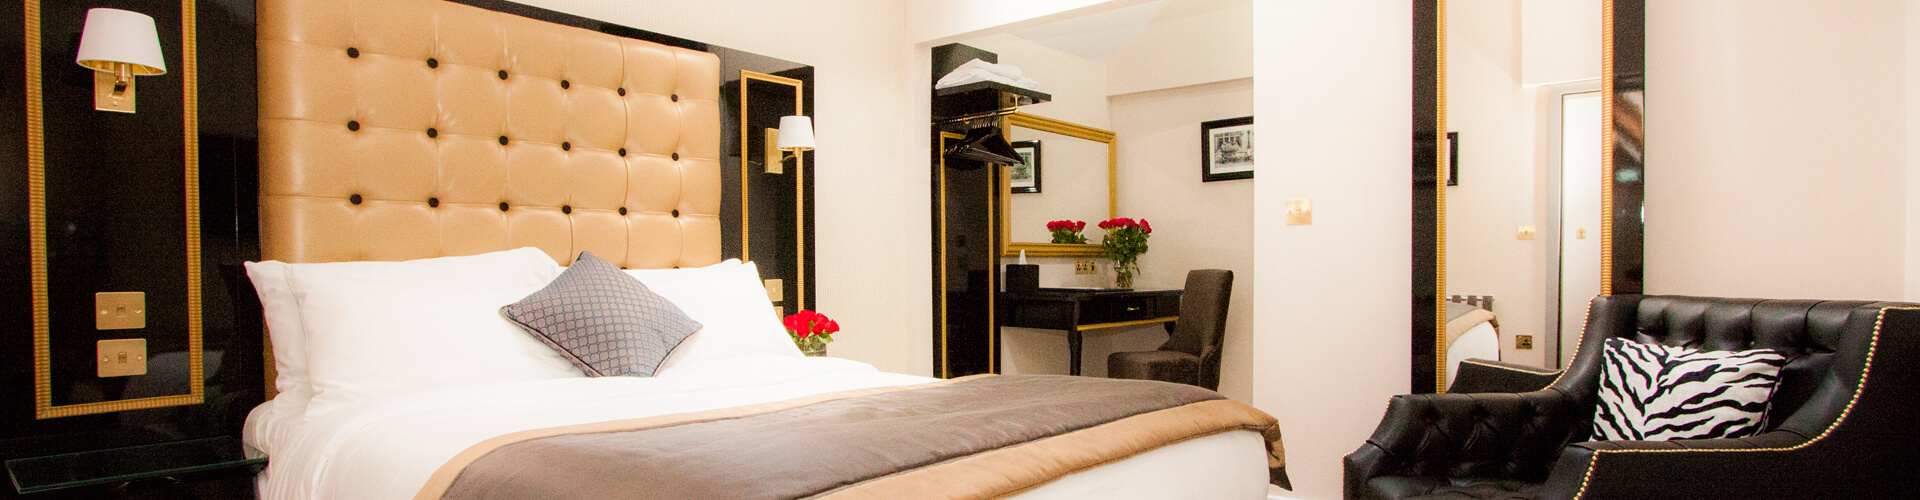 Hotel Refurbishment Contractors - Chrysalis